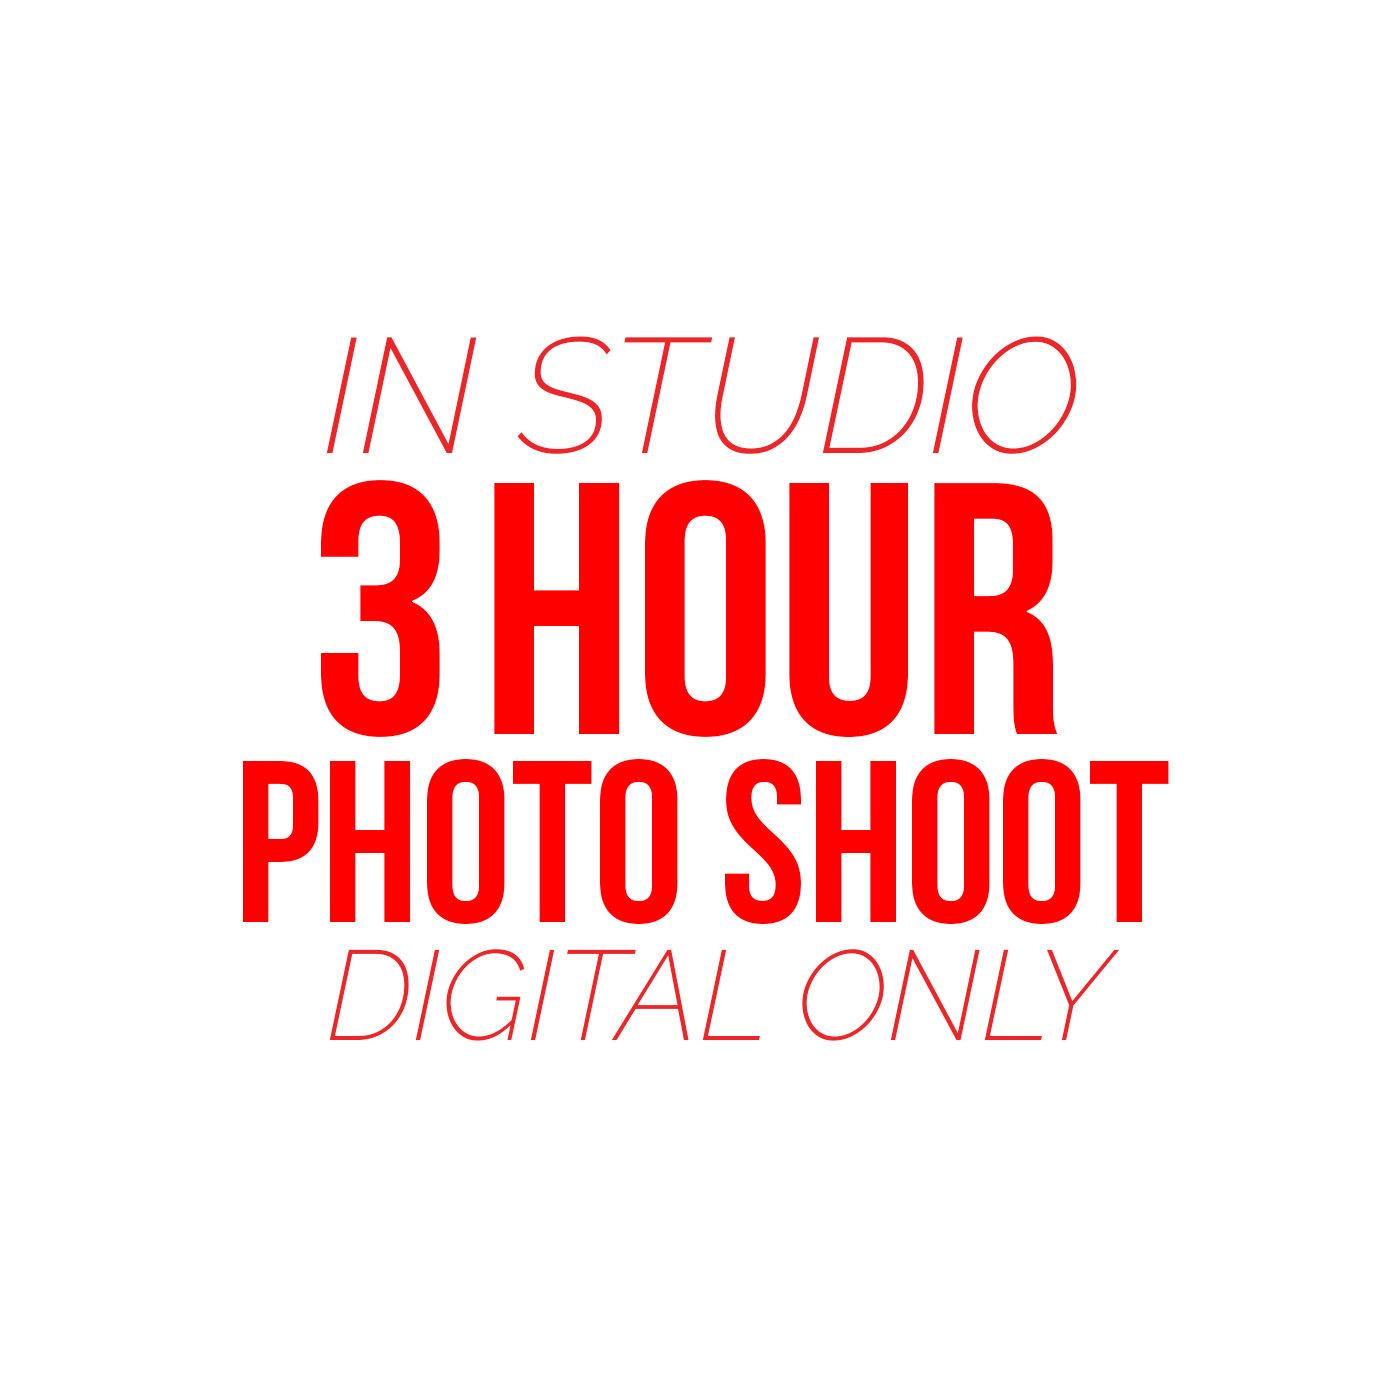 3 Hour Photo Shoot